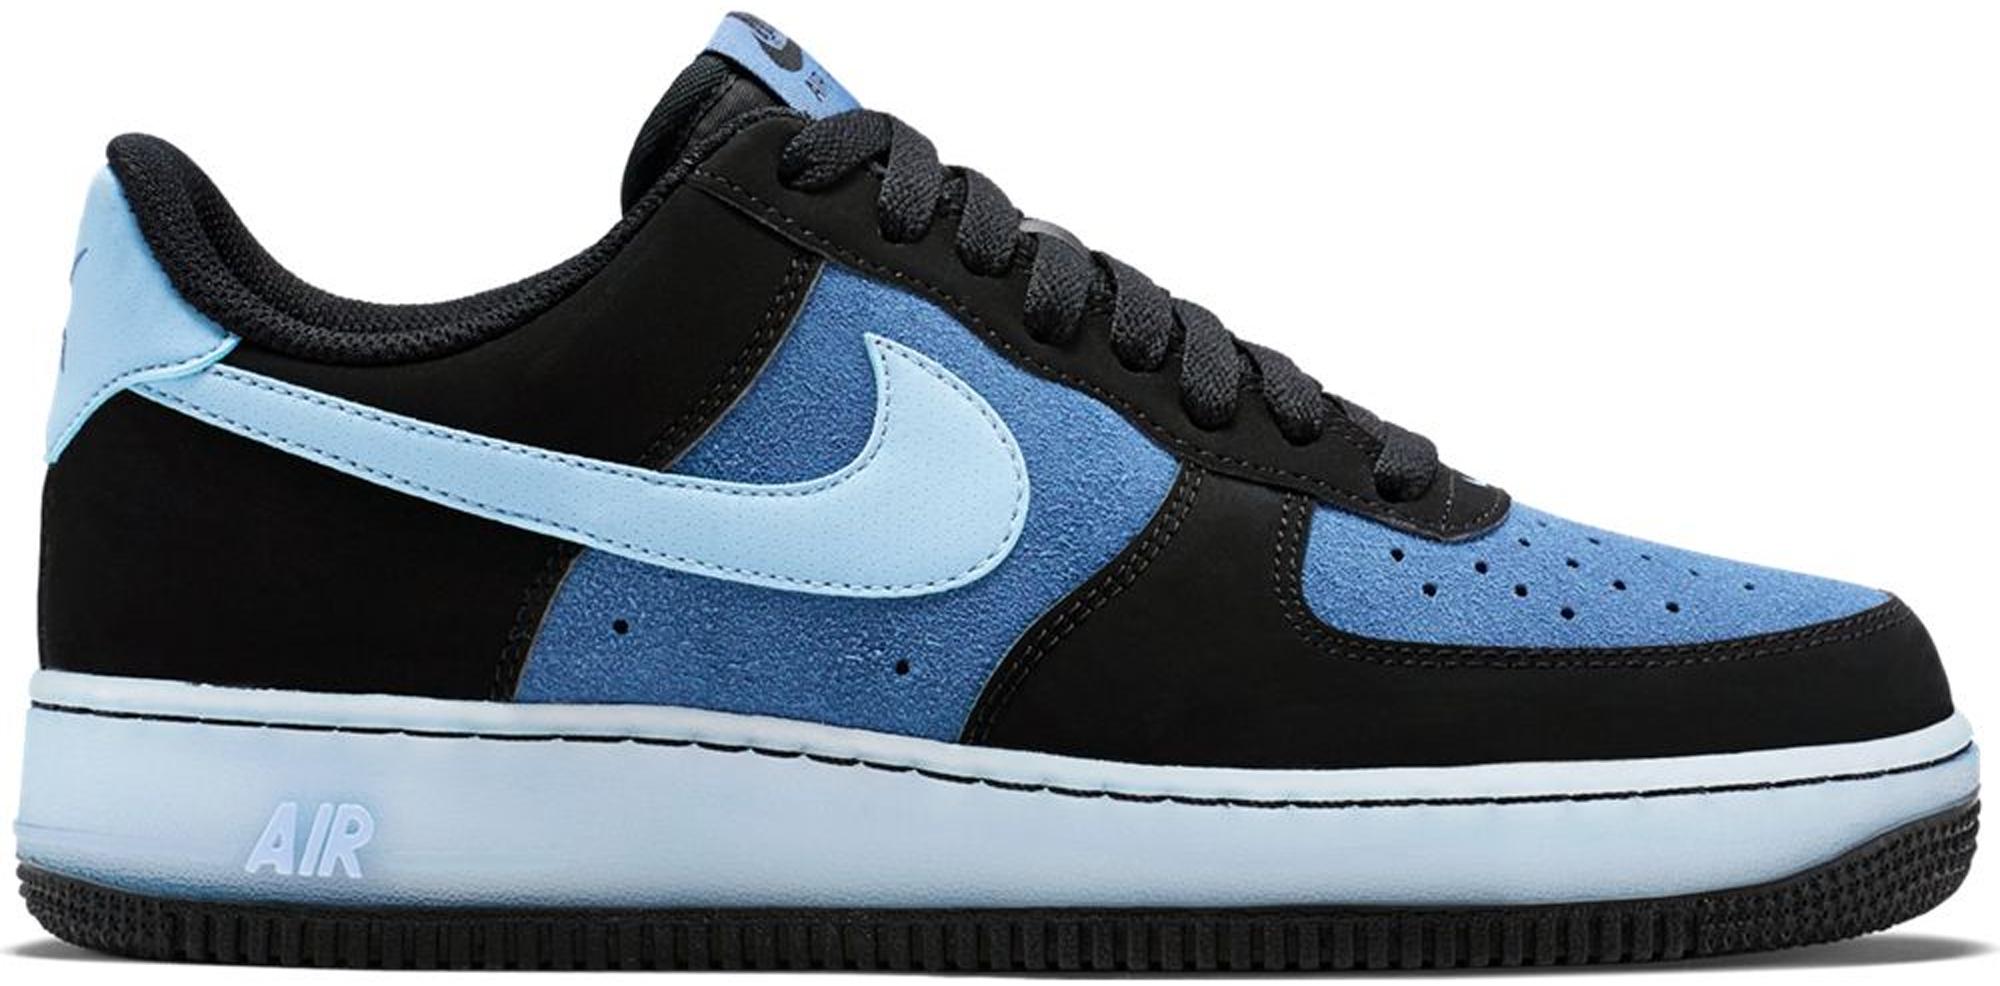 Nike Air Force 1 Low Blue Legend